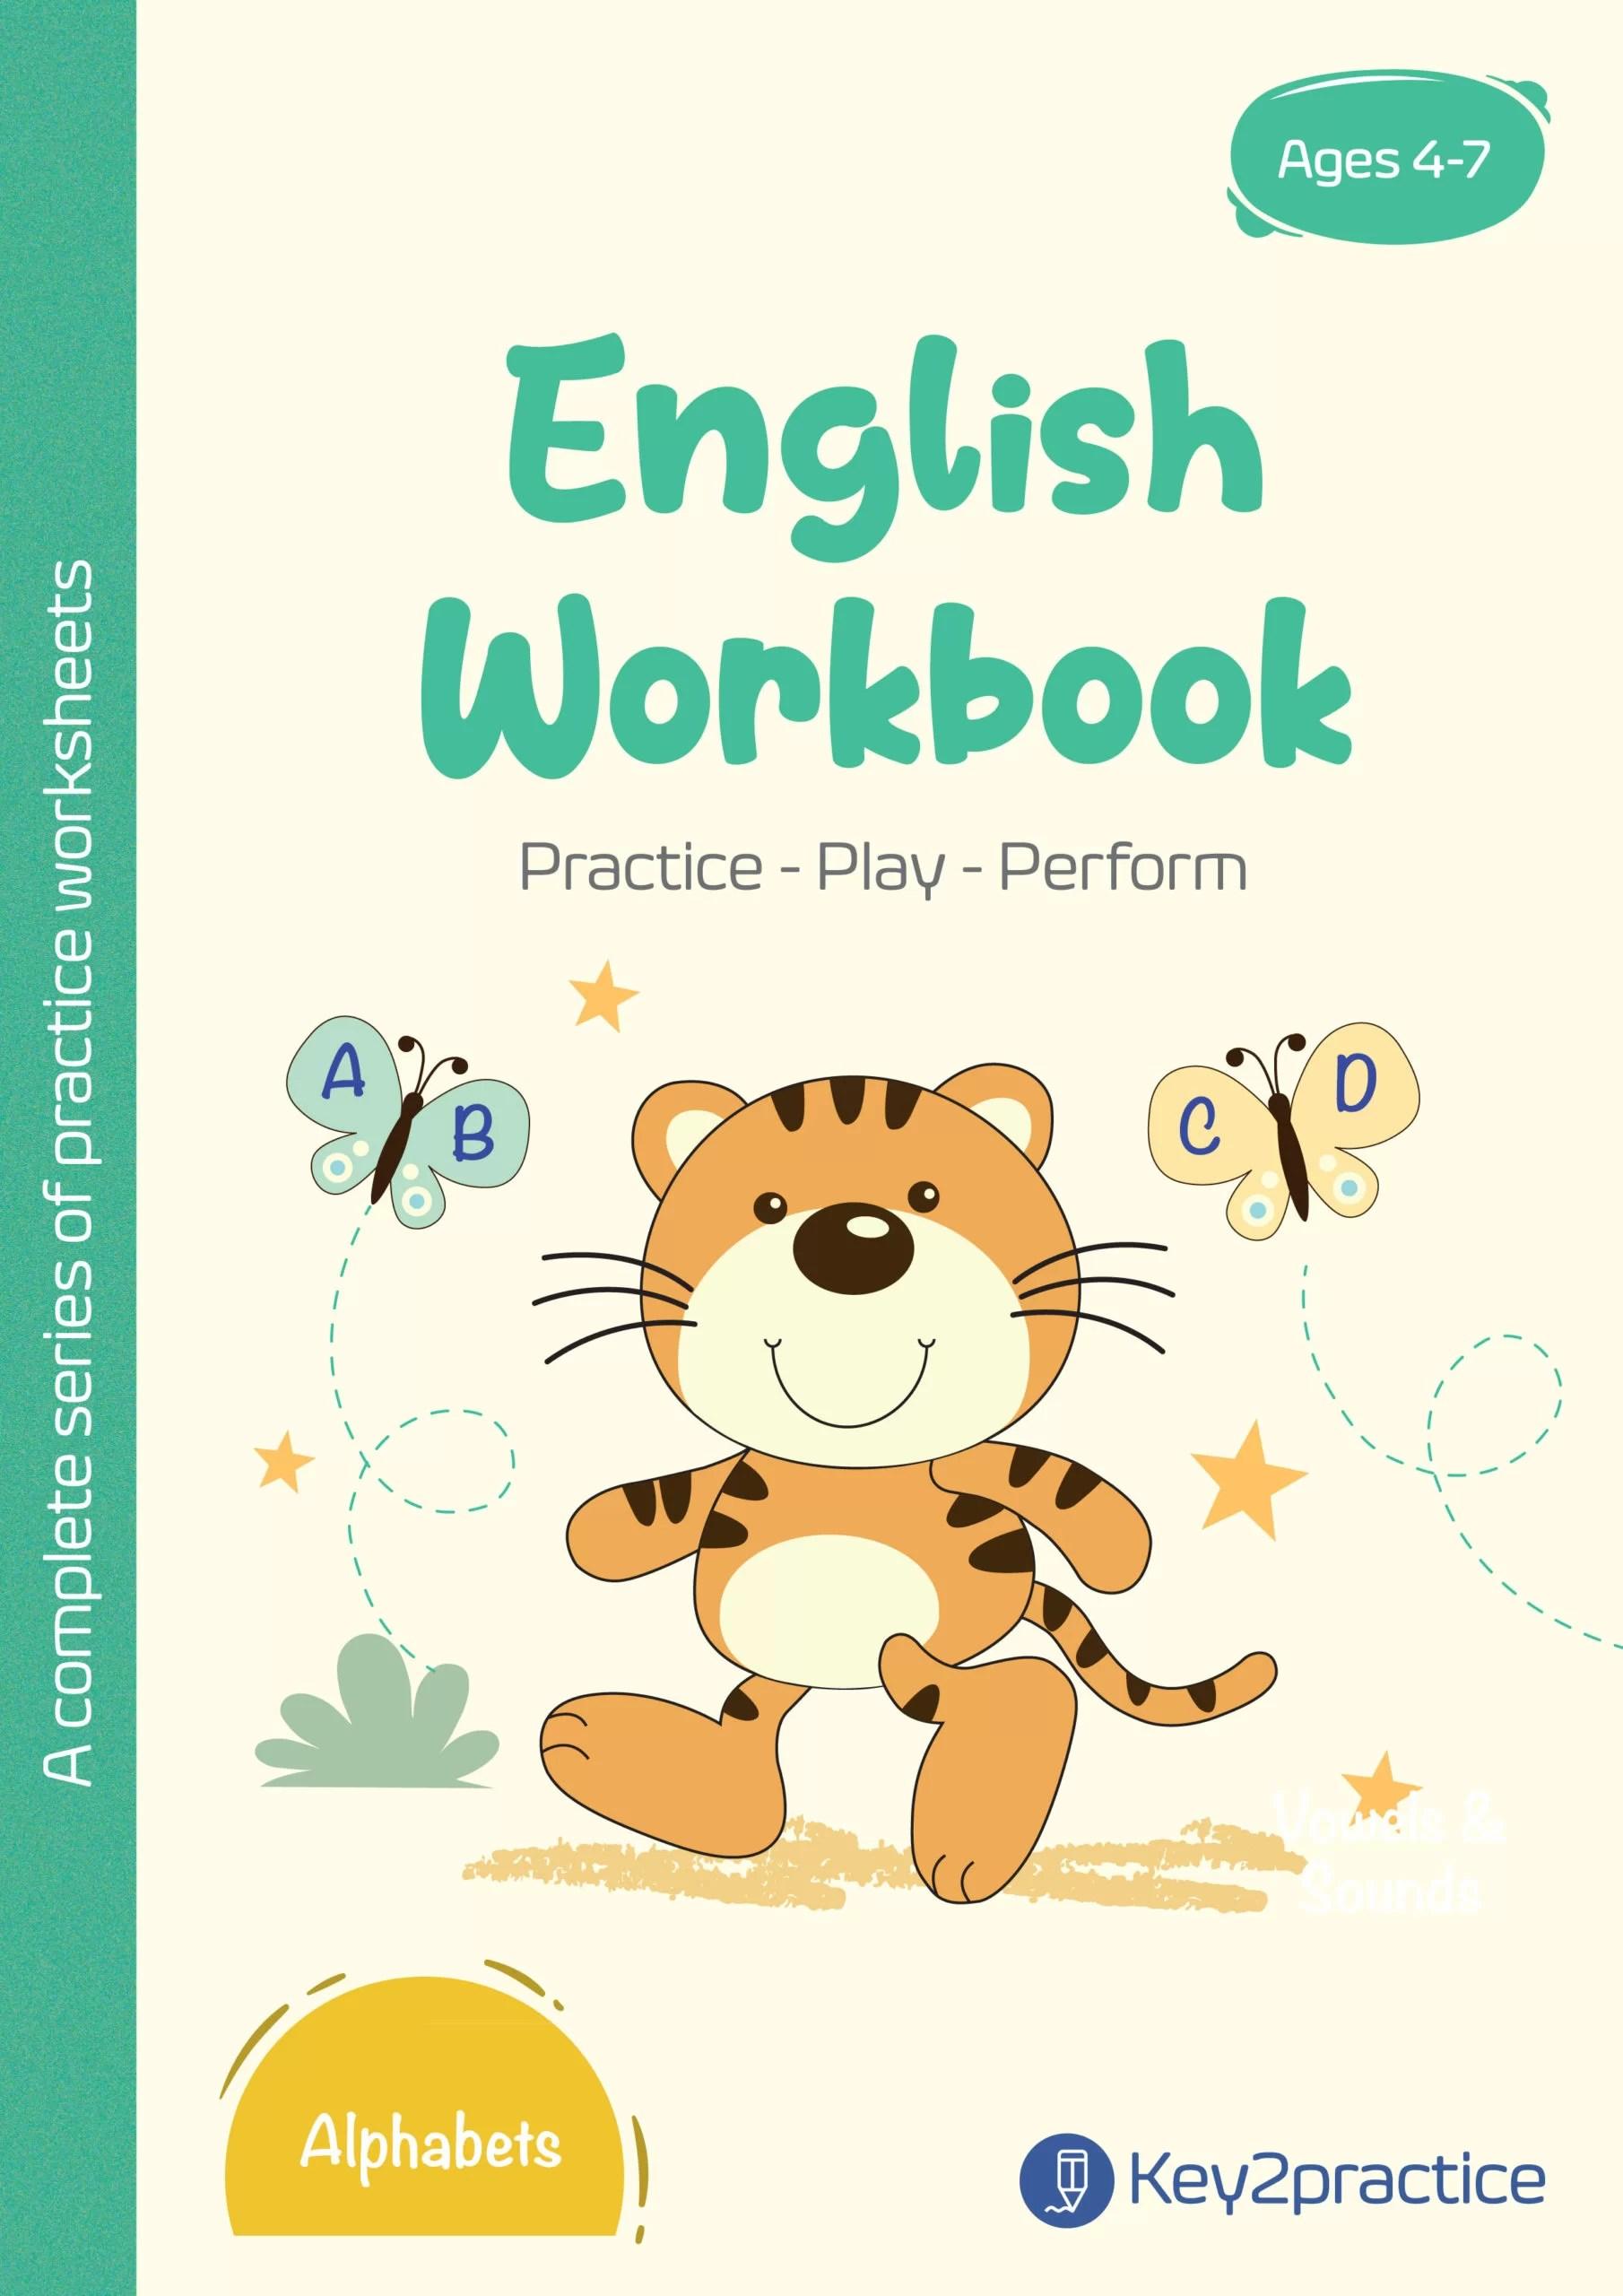 medium resolution of Worksheets on Alphabets Pre-primary - key2practice Workbooks